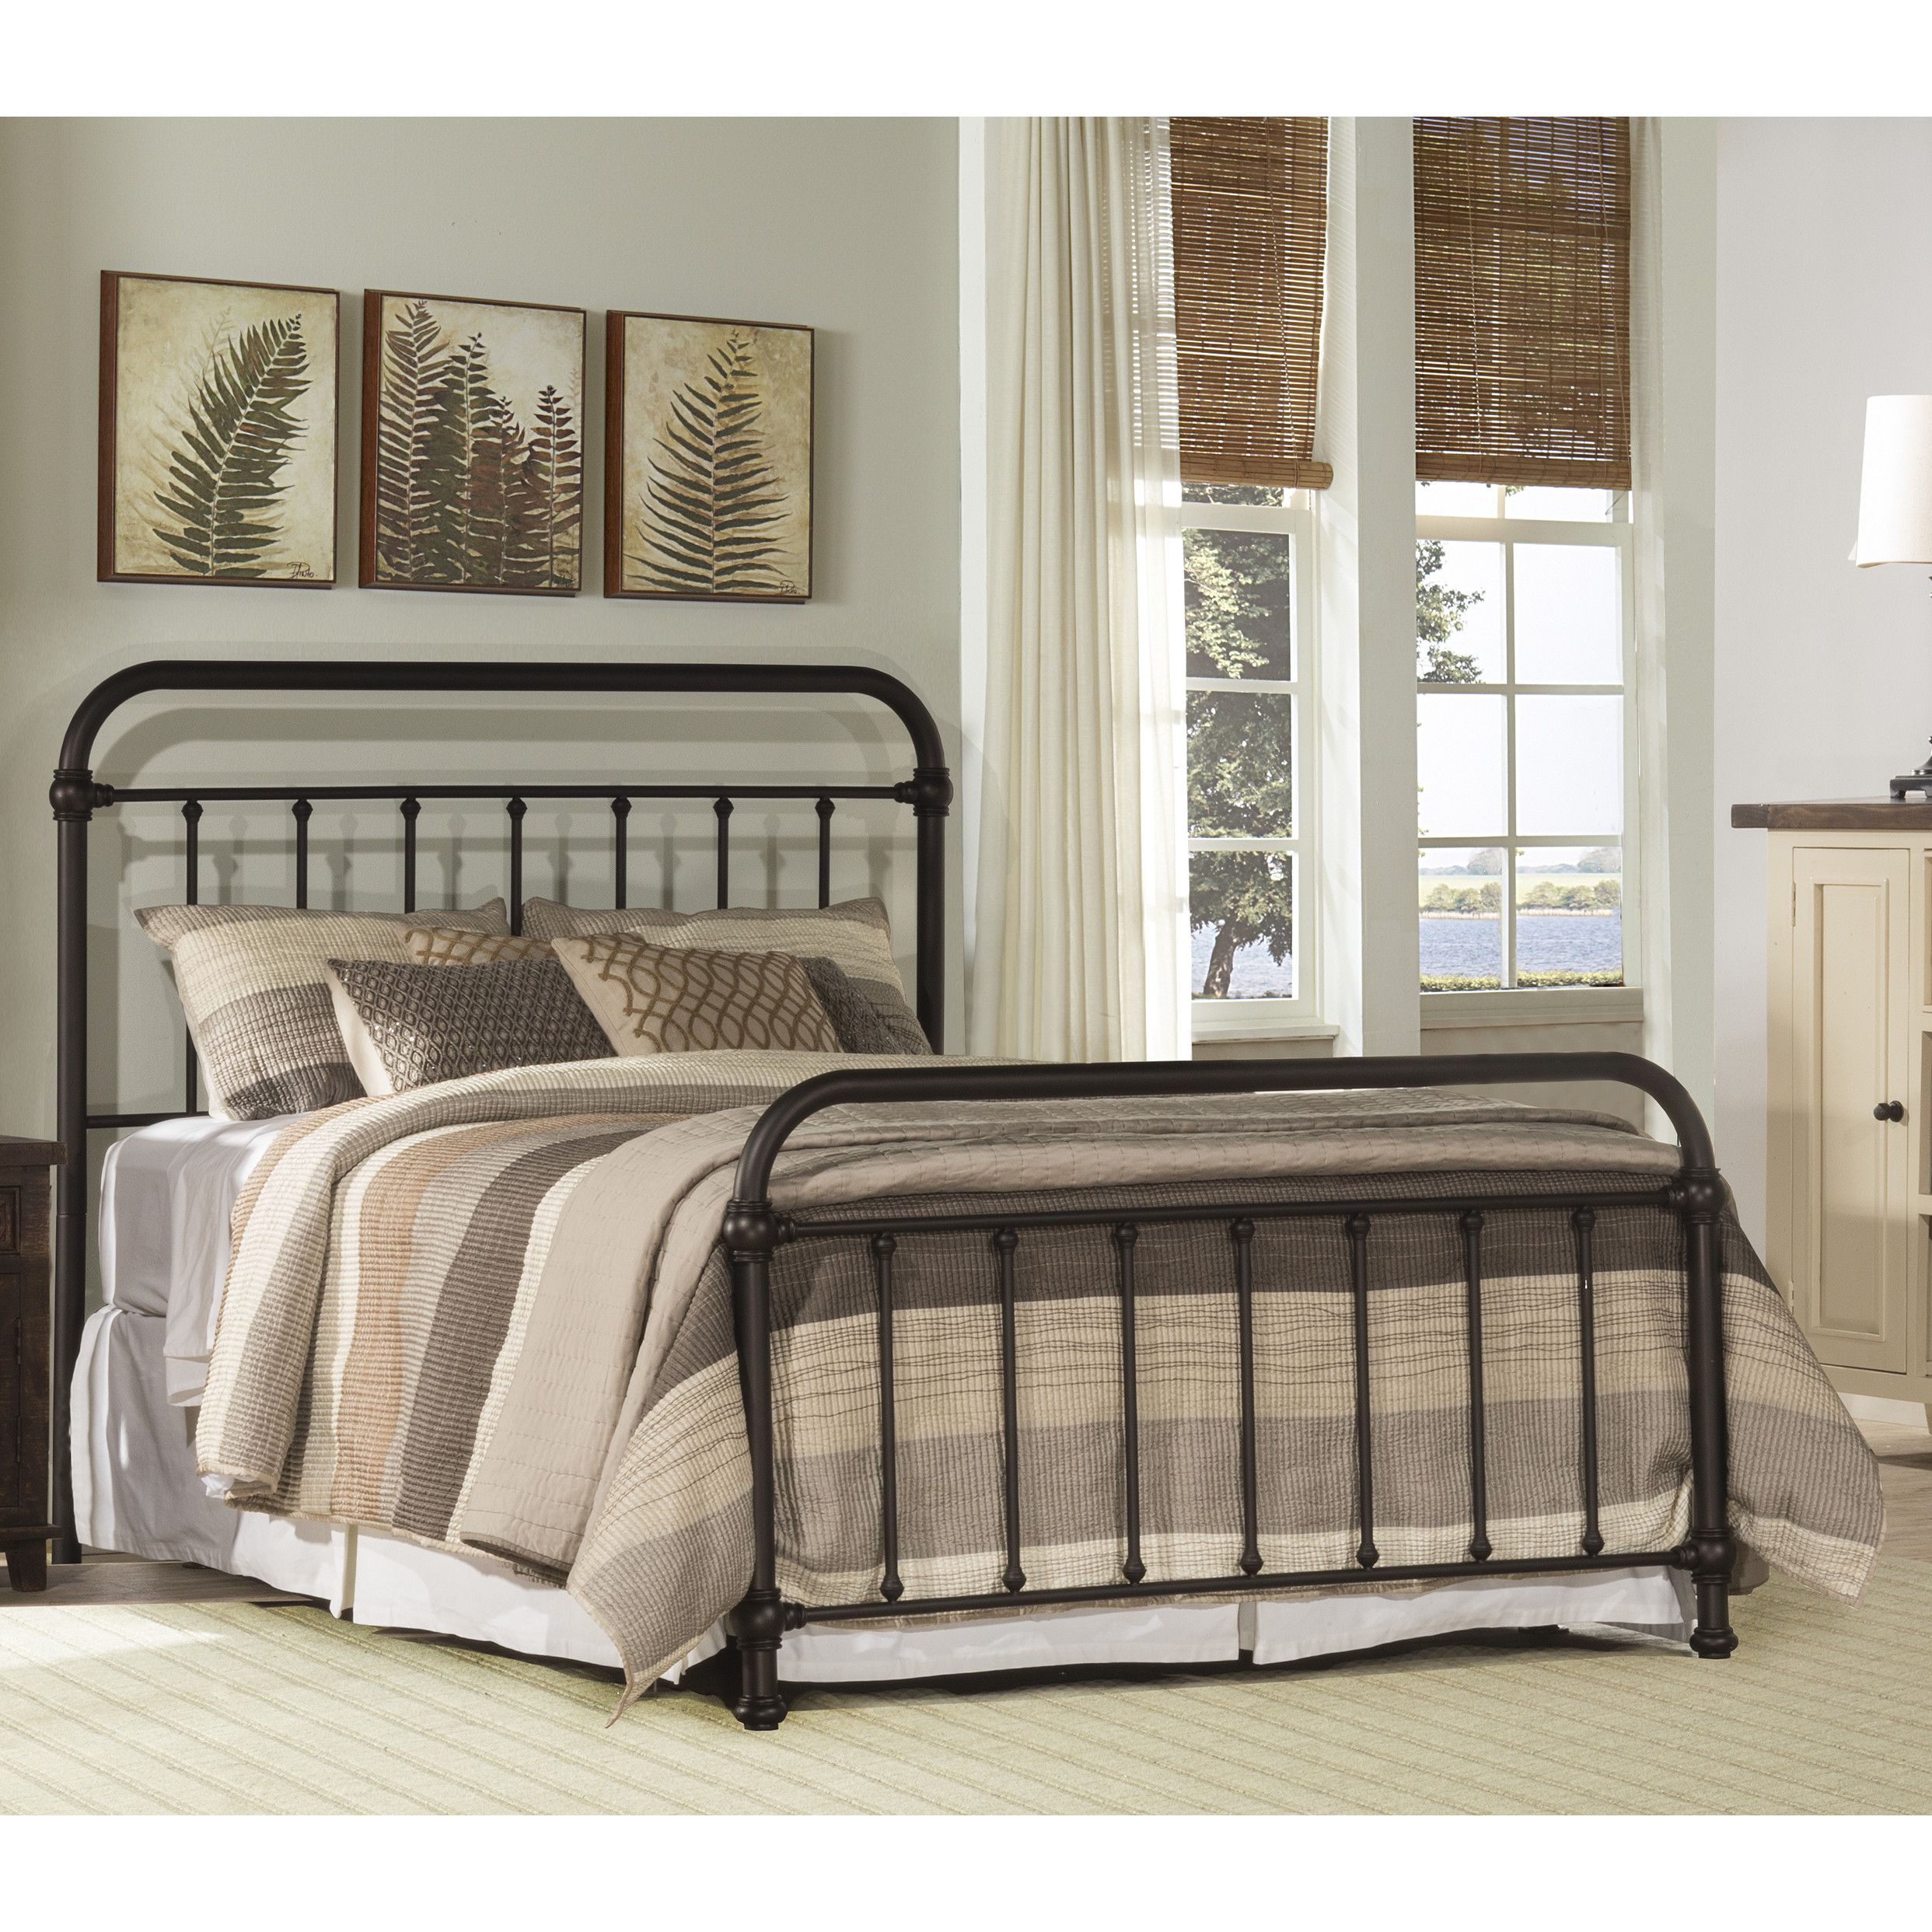 Harlow Metal Panel Bed